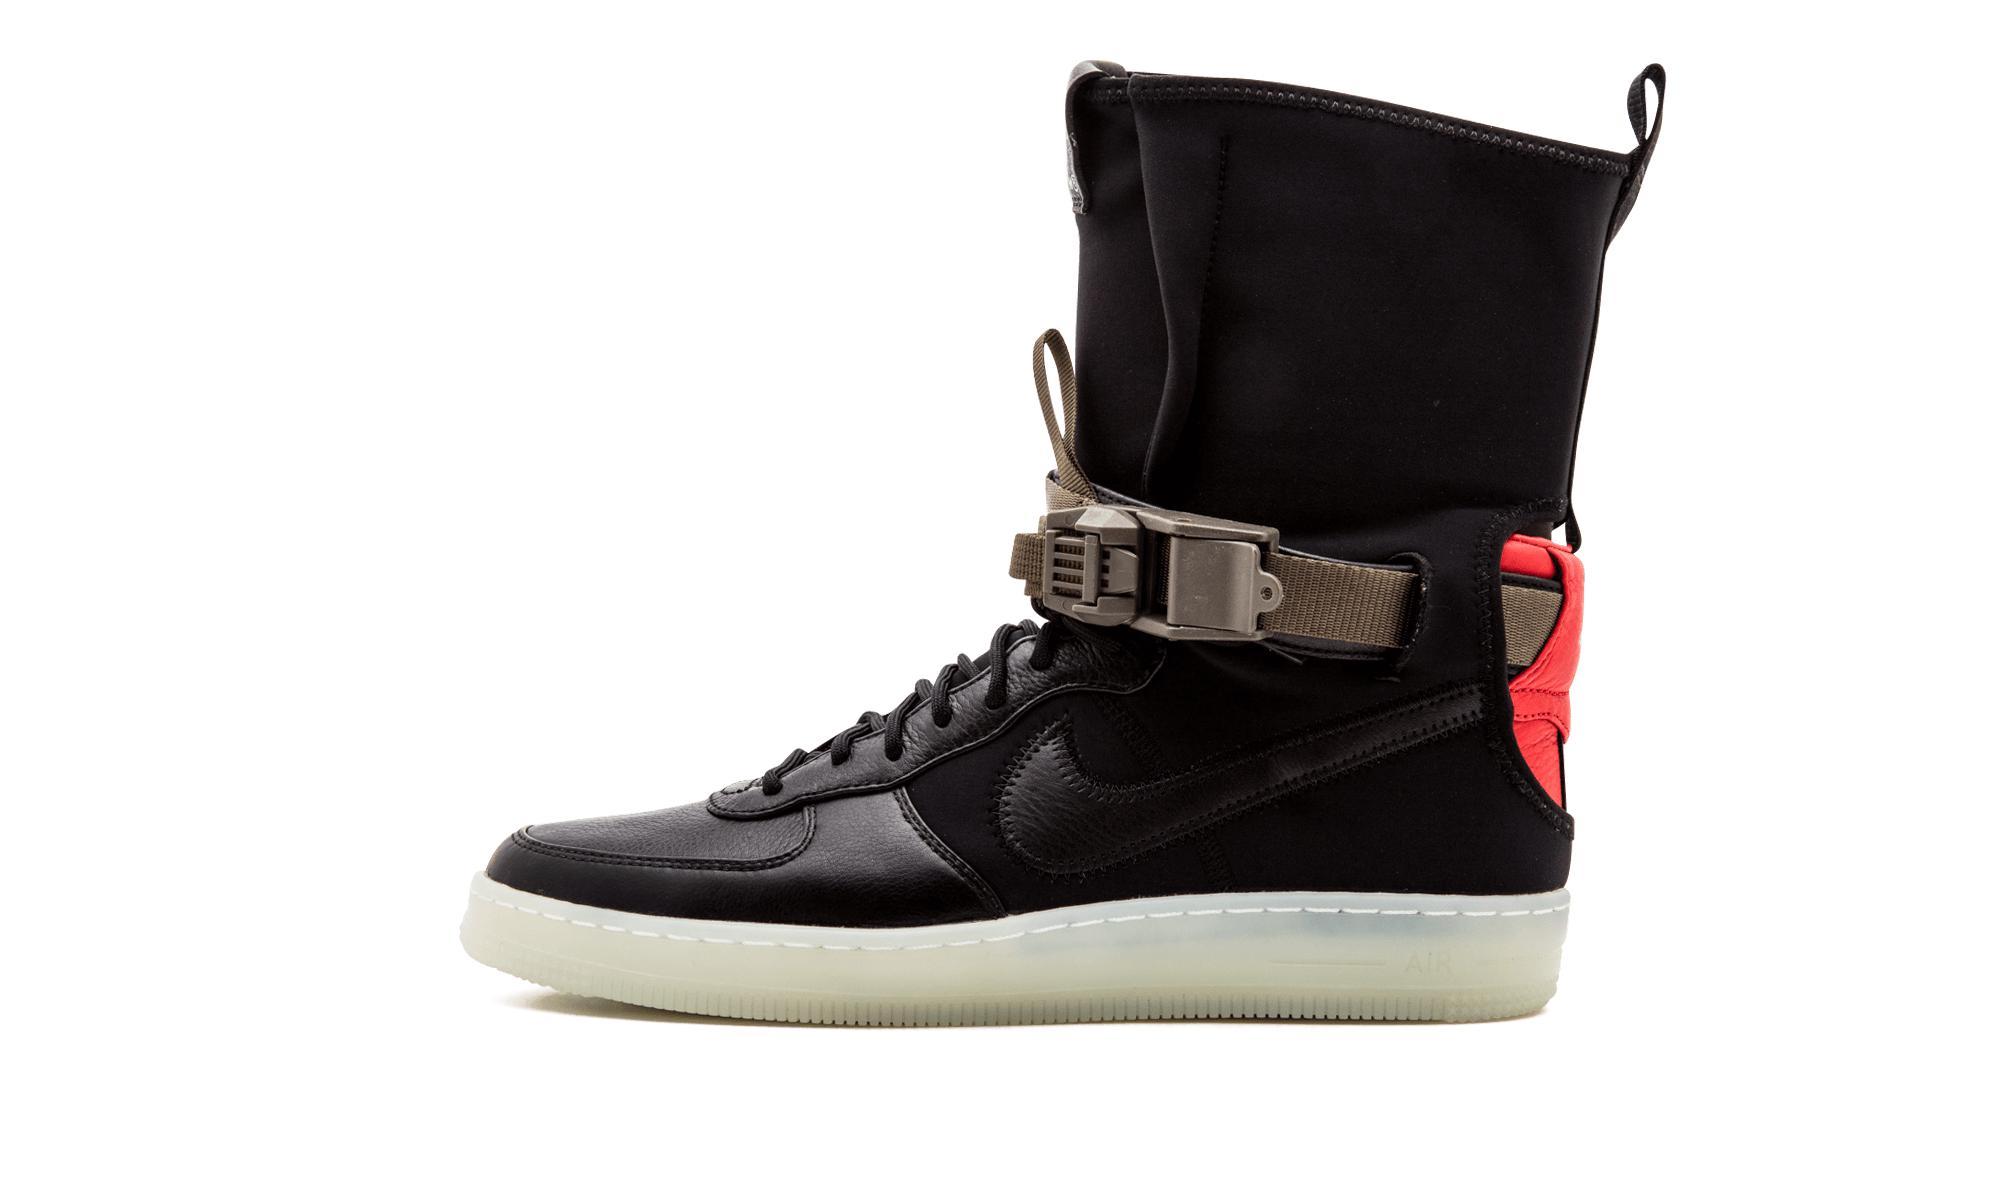 c41b9e03844 Lyst - Nike Af1 Downtown Hi Sp acronym in Black for Men - Save 40%